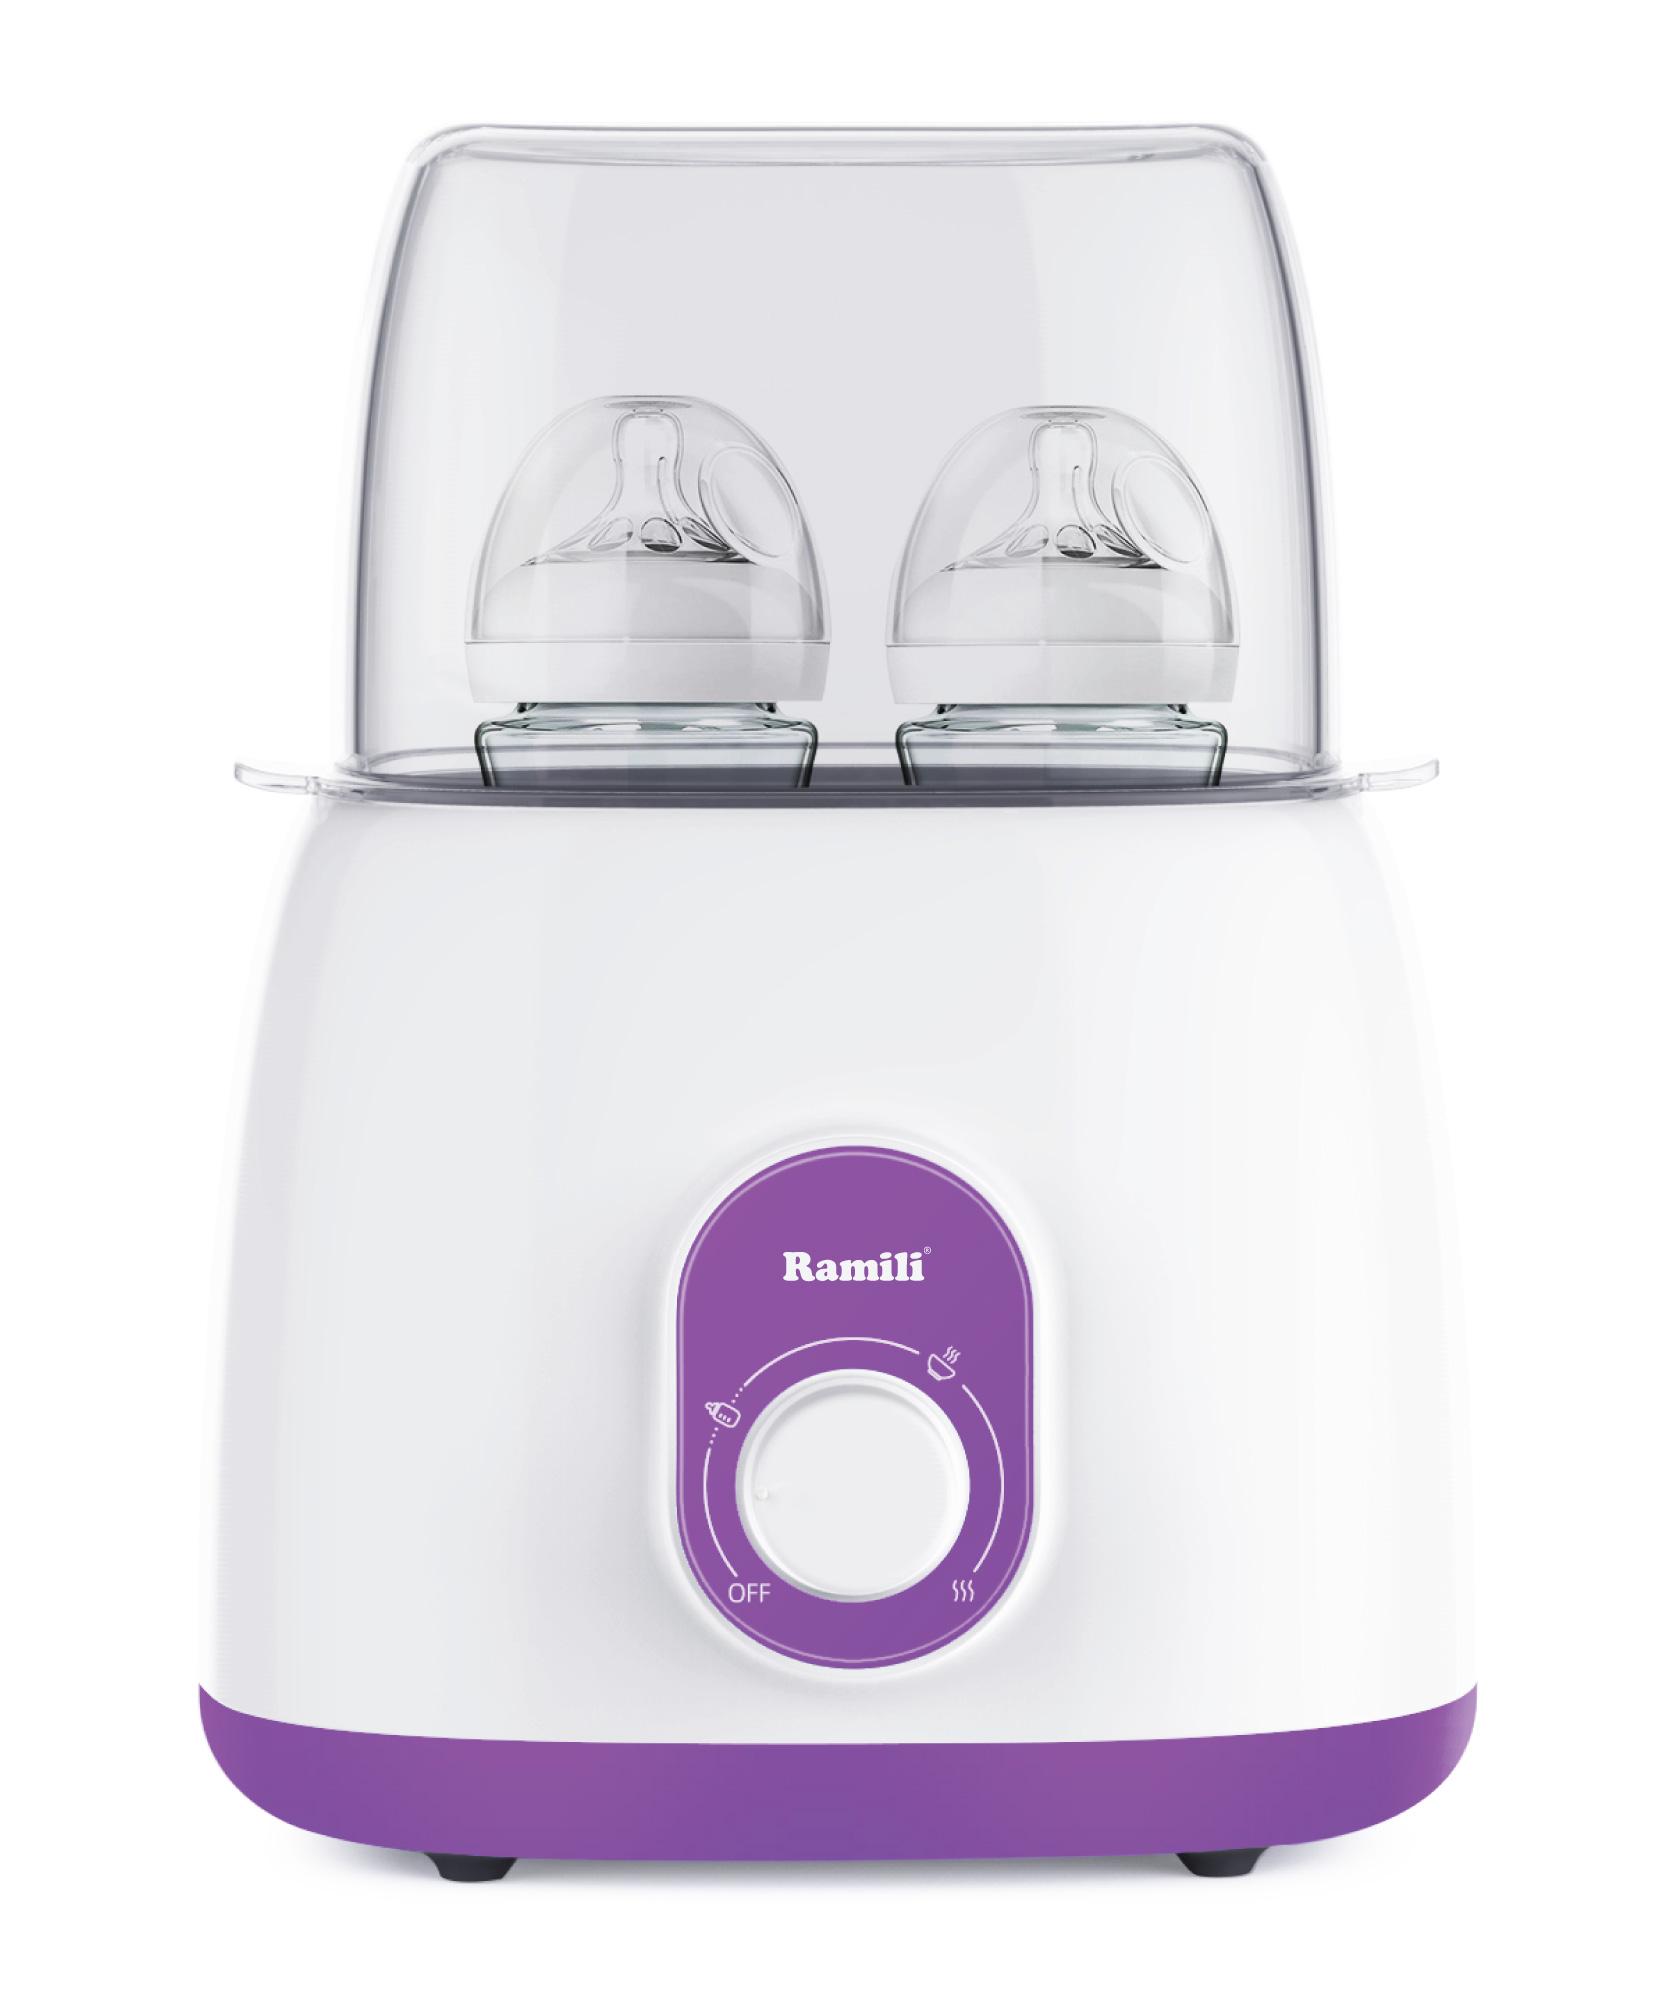 Ramili<sup>®</sup> 4 in 1 Baby Bottle Warmer & Sterilizer BFW300